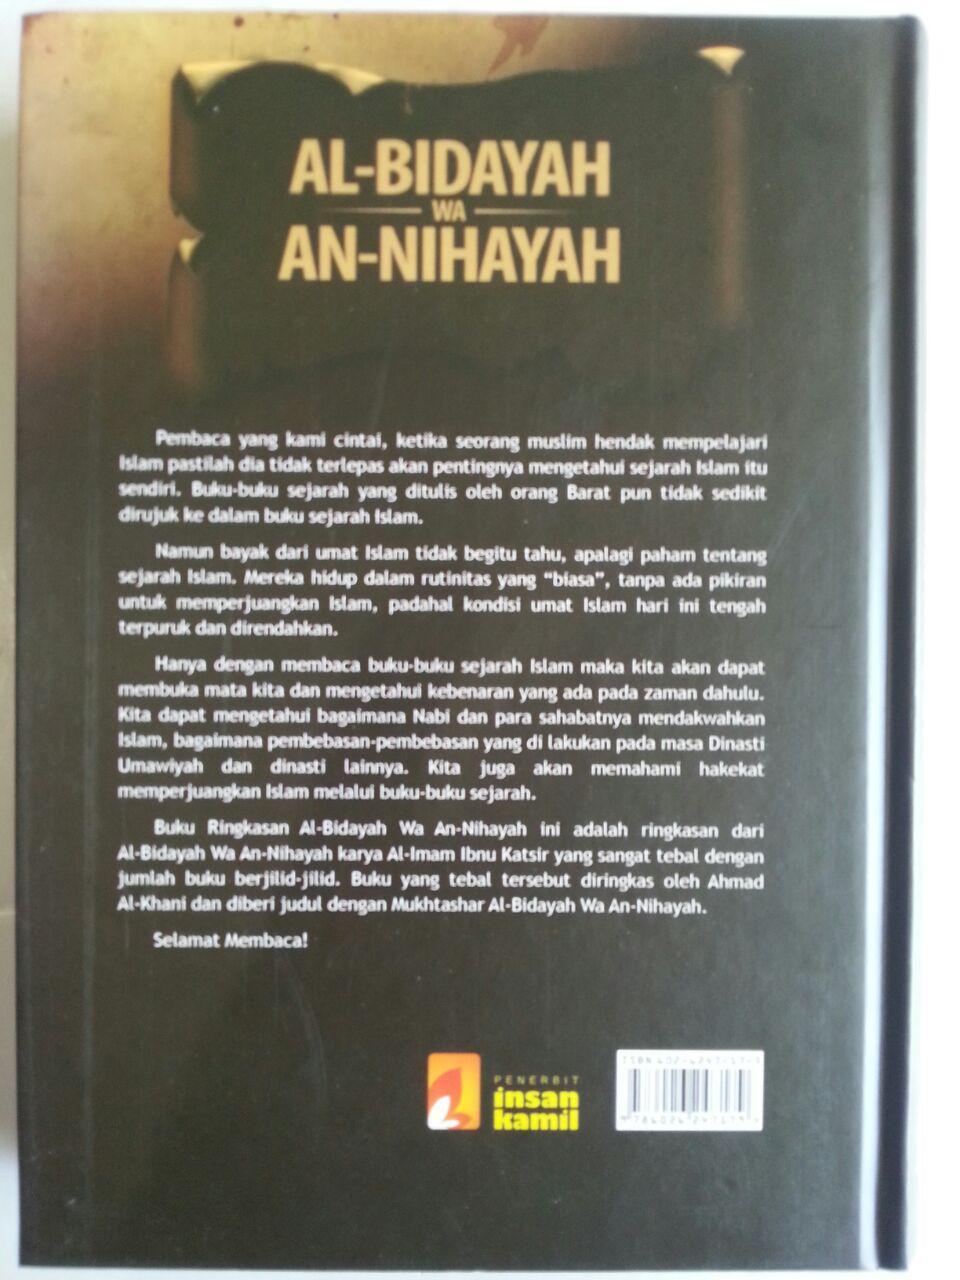 Buku Mukhtashar Al-Bidayah Wa An-Nihayah Ibnu Katsir cover